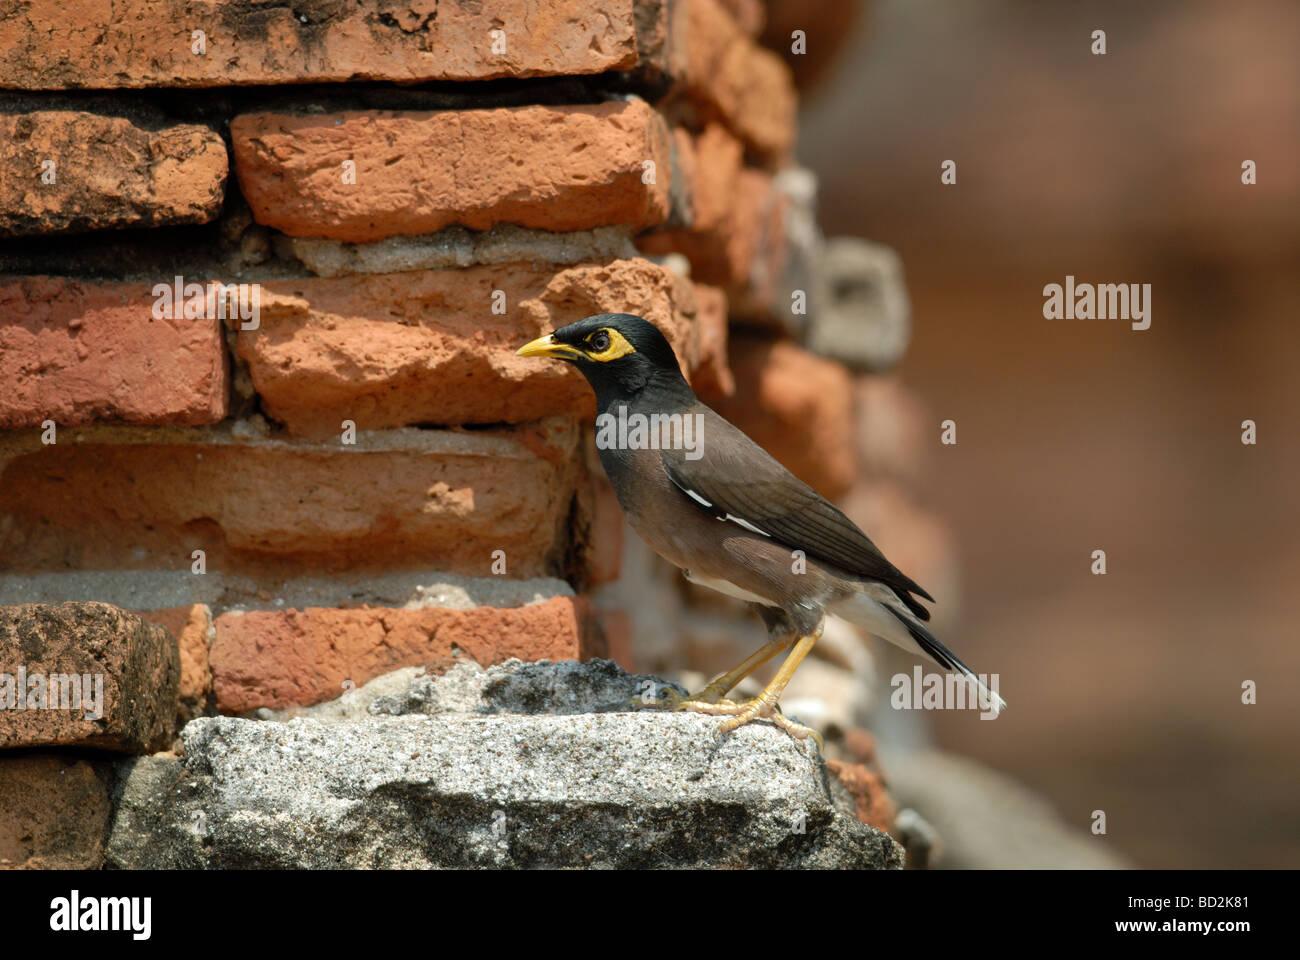 Common Myna / Indian Myna (Acridotheres tristis) - Stock Image